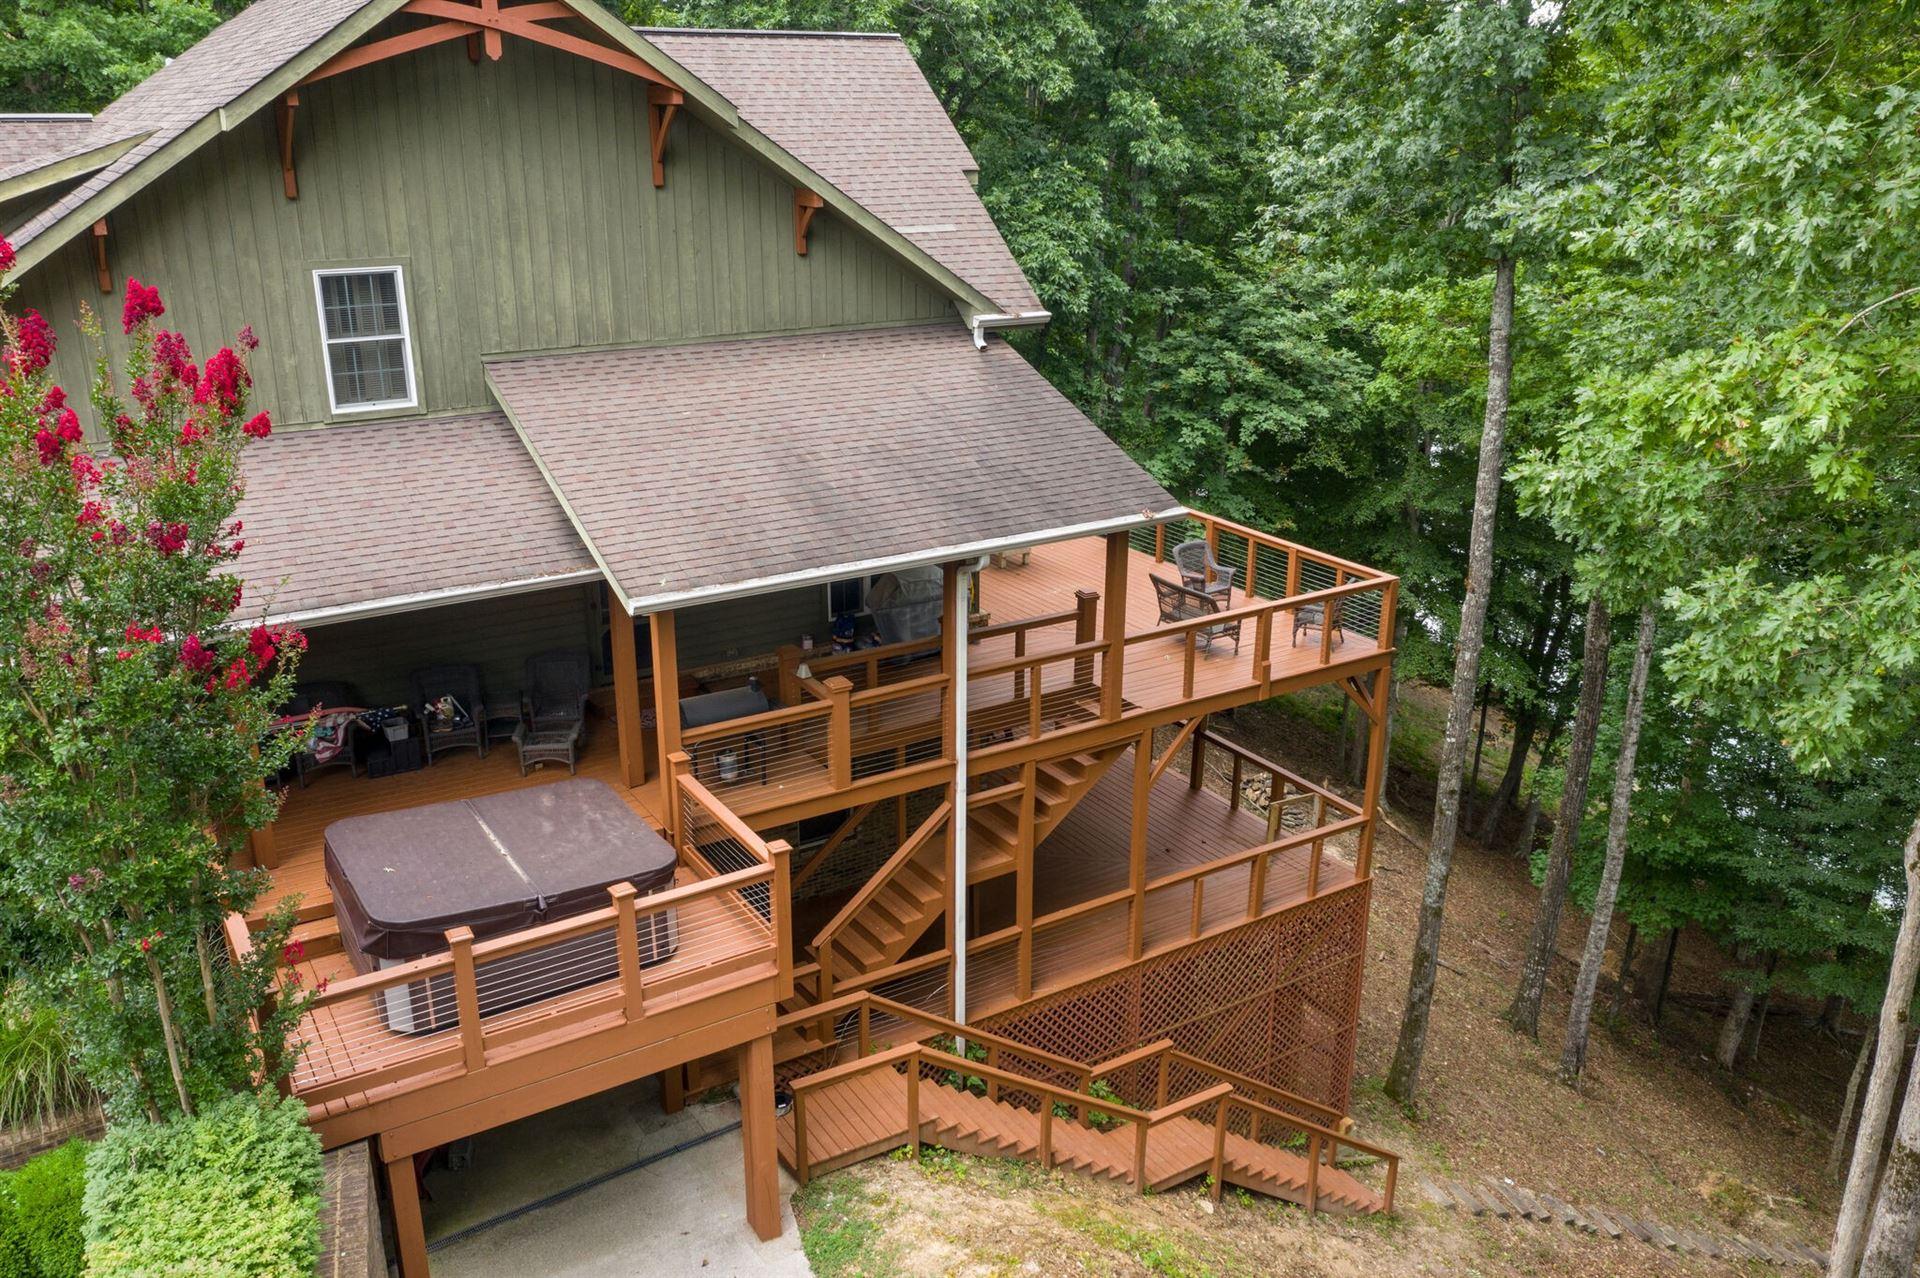 348 Grandview Lake Rd, Estill Springs, TN 37330 - MLS#: 2241999